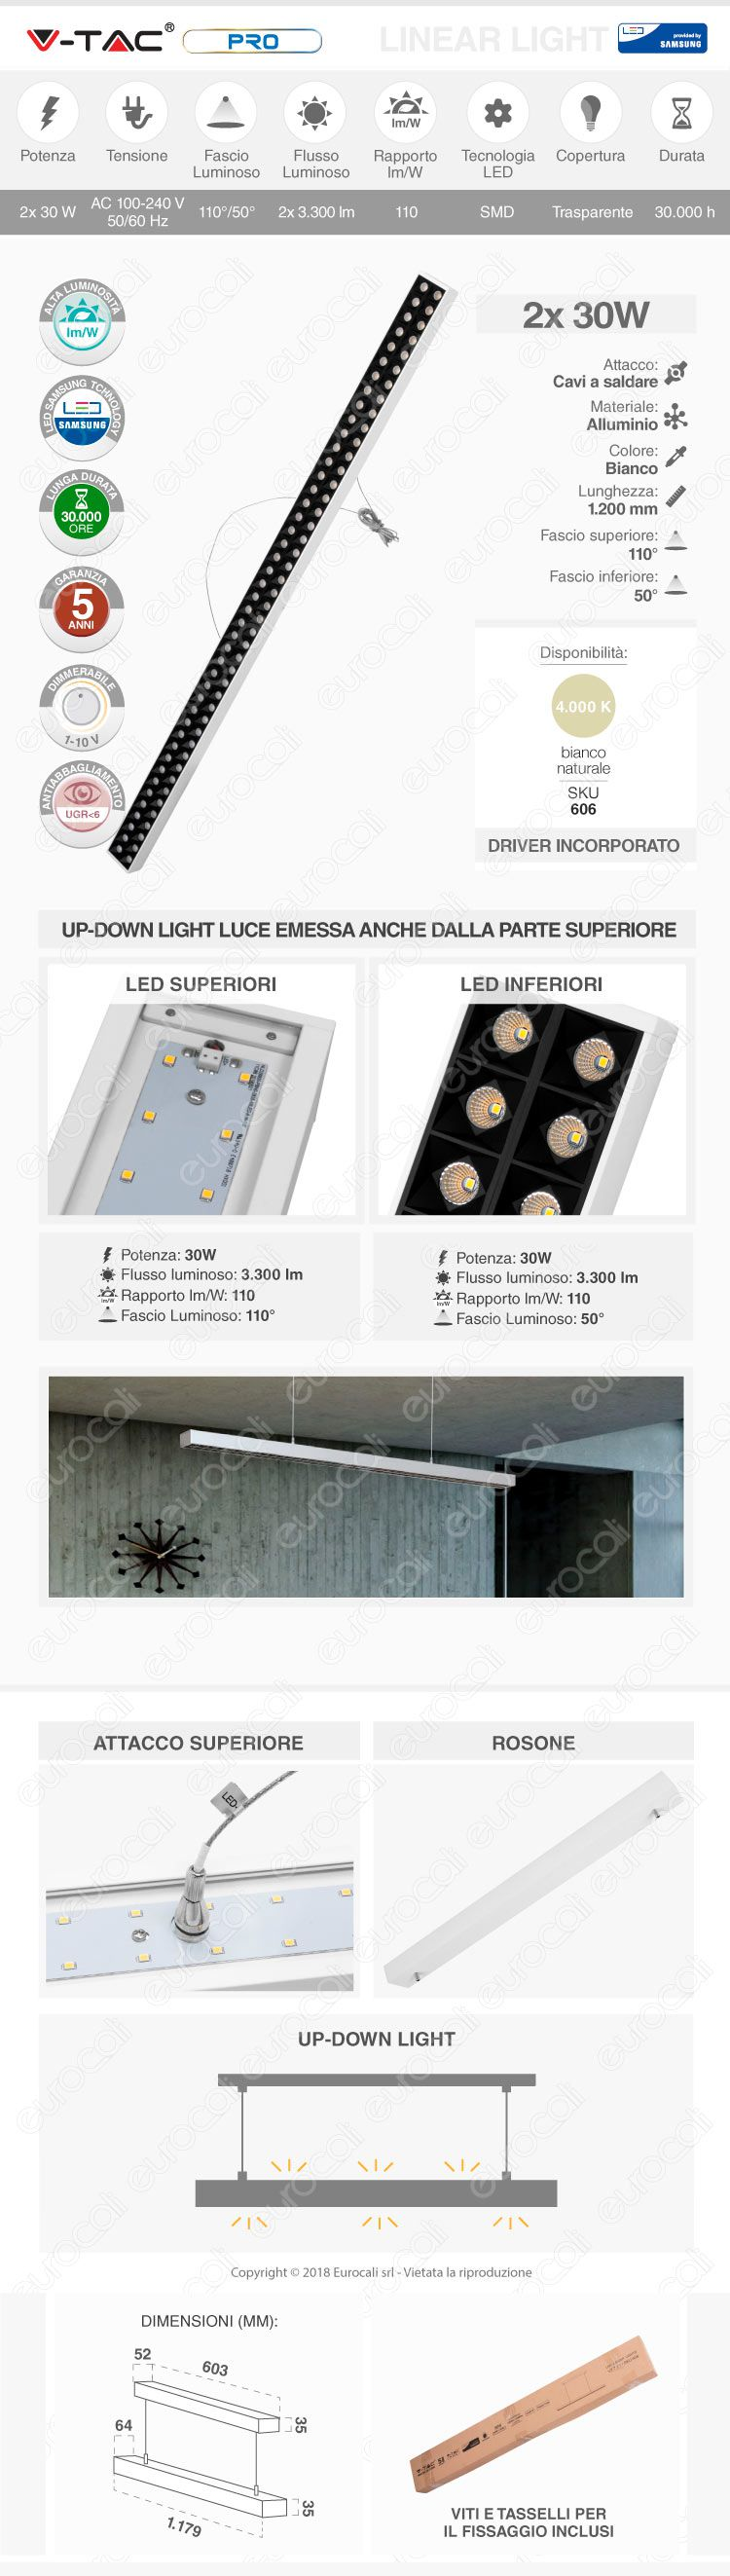 V-Tac PRO VT-7-61 Lampada LED a Sospensione Linear Light 60W Chip Samsung White Body Dimmerabile